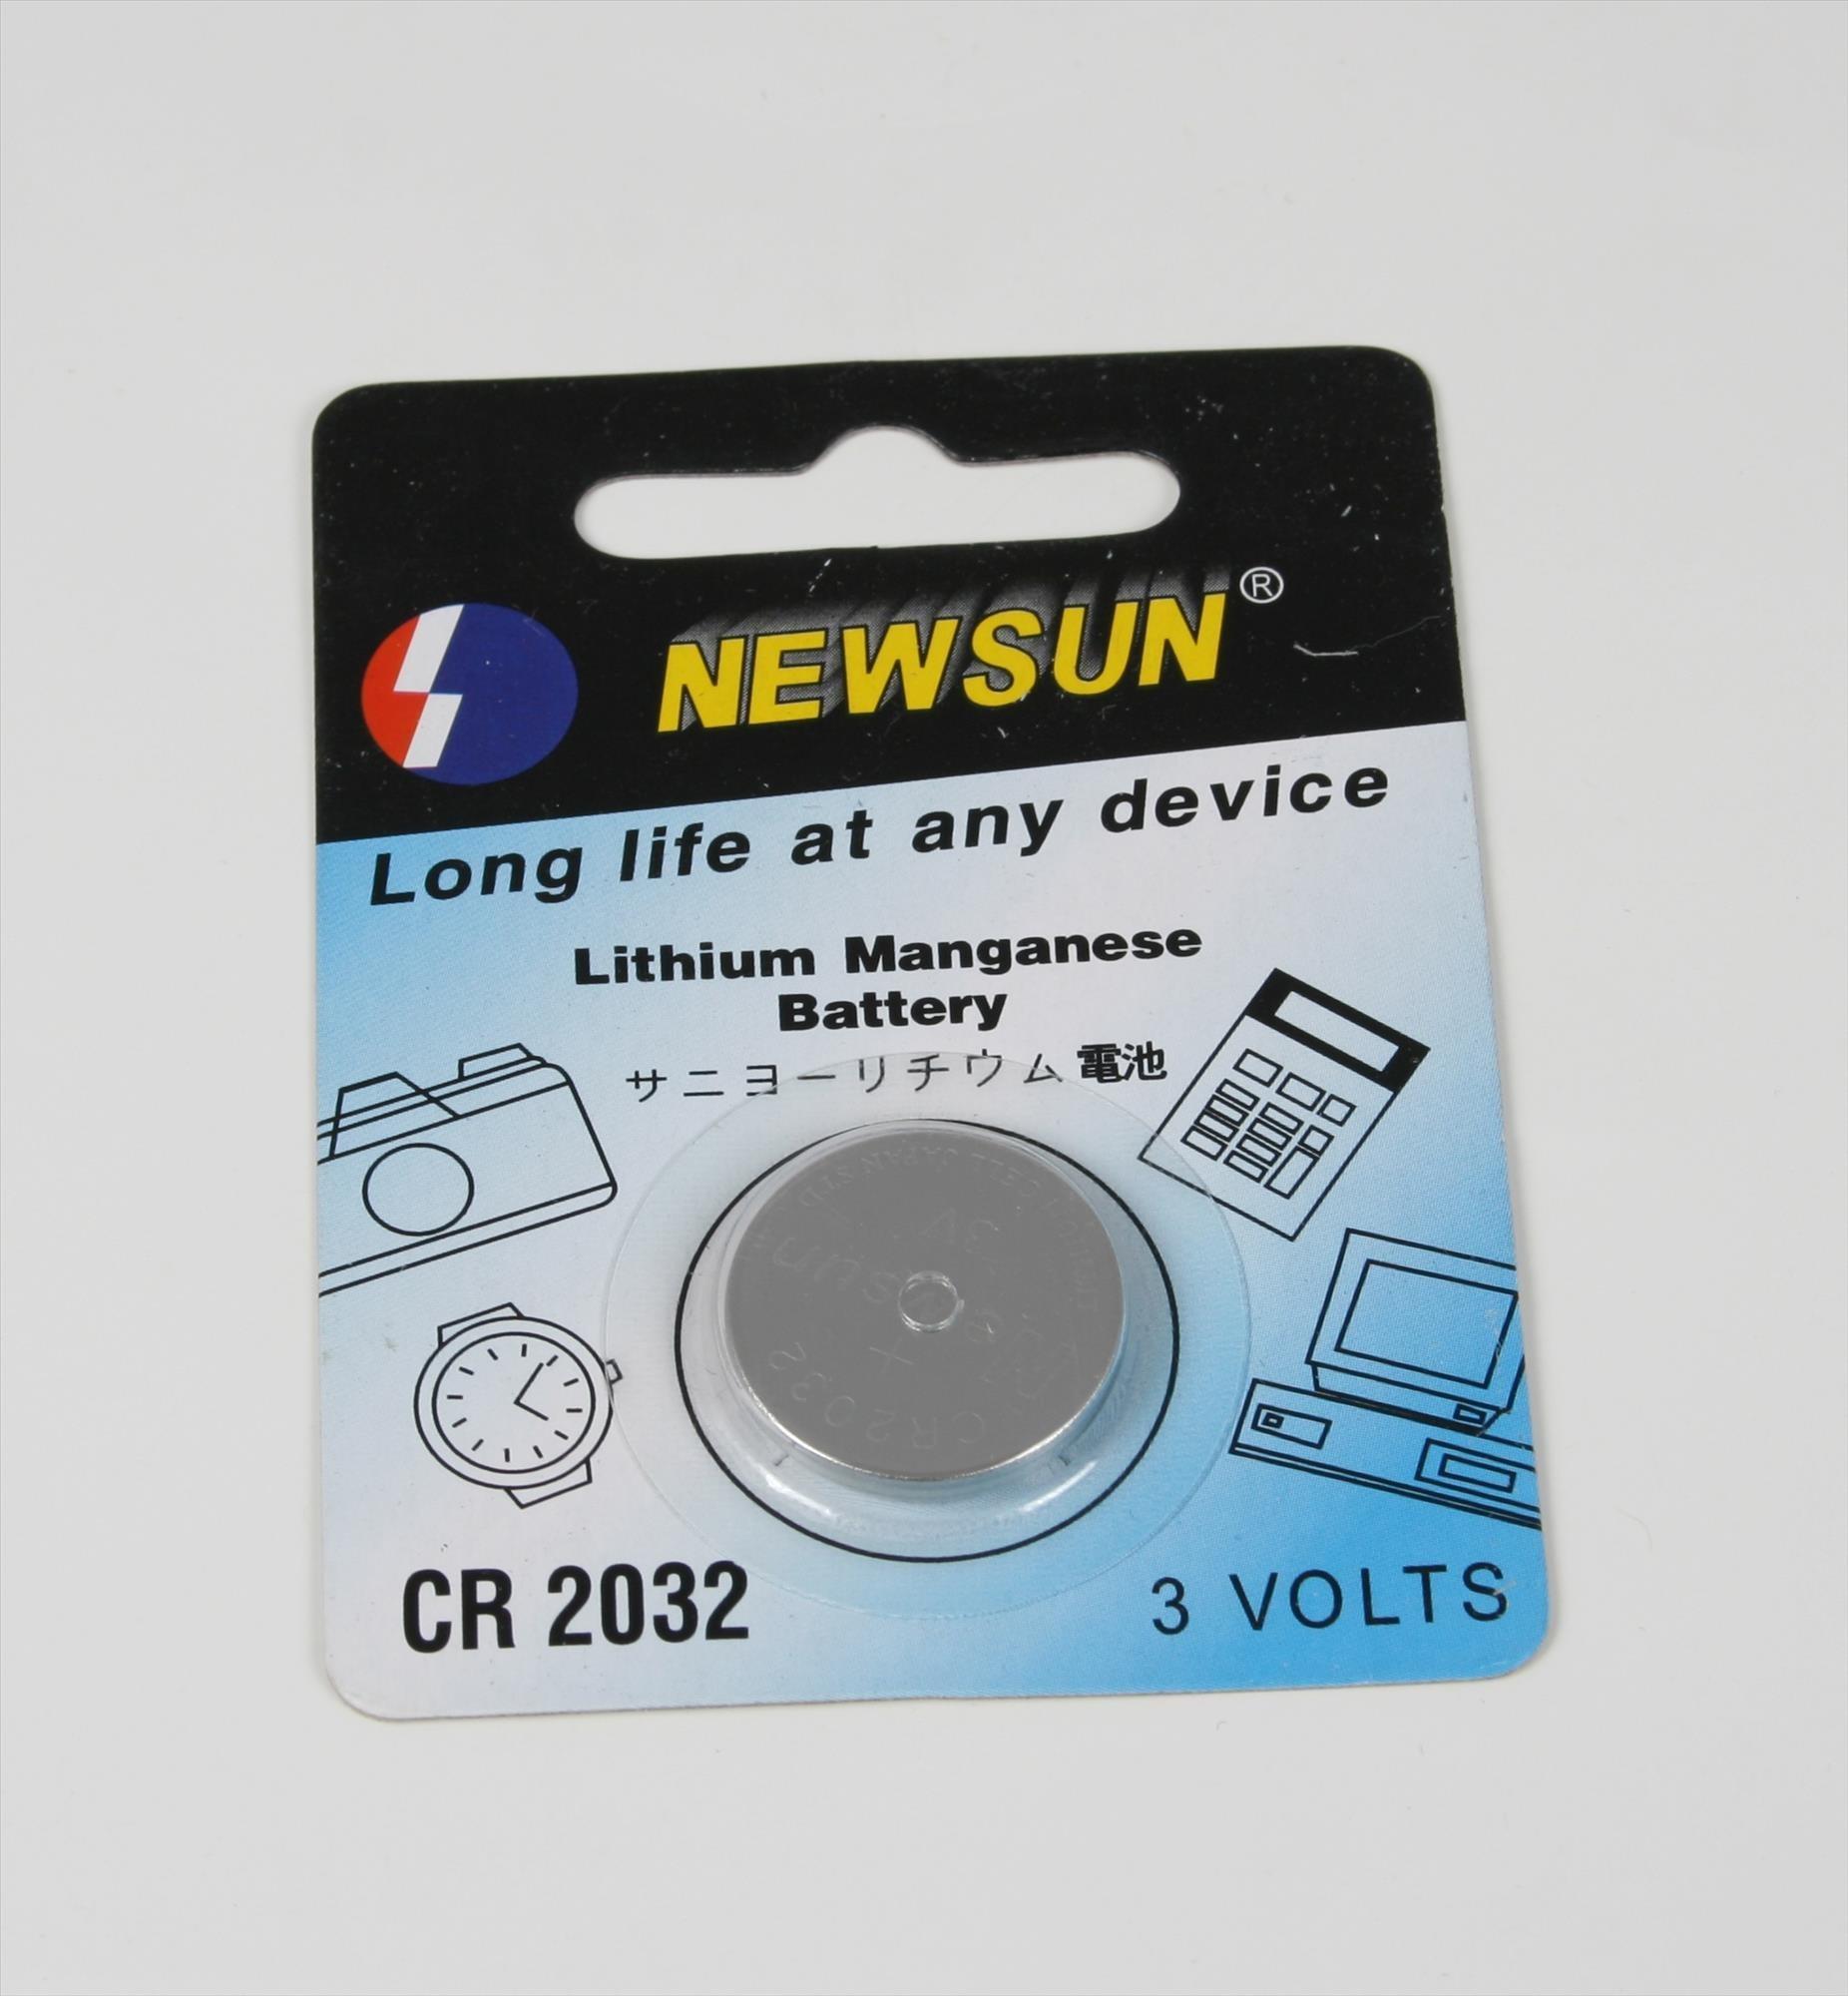 Battery 3V Lithium for Celestron Star Pointer, Baader Sky Surfer III / V and Vario-Finder